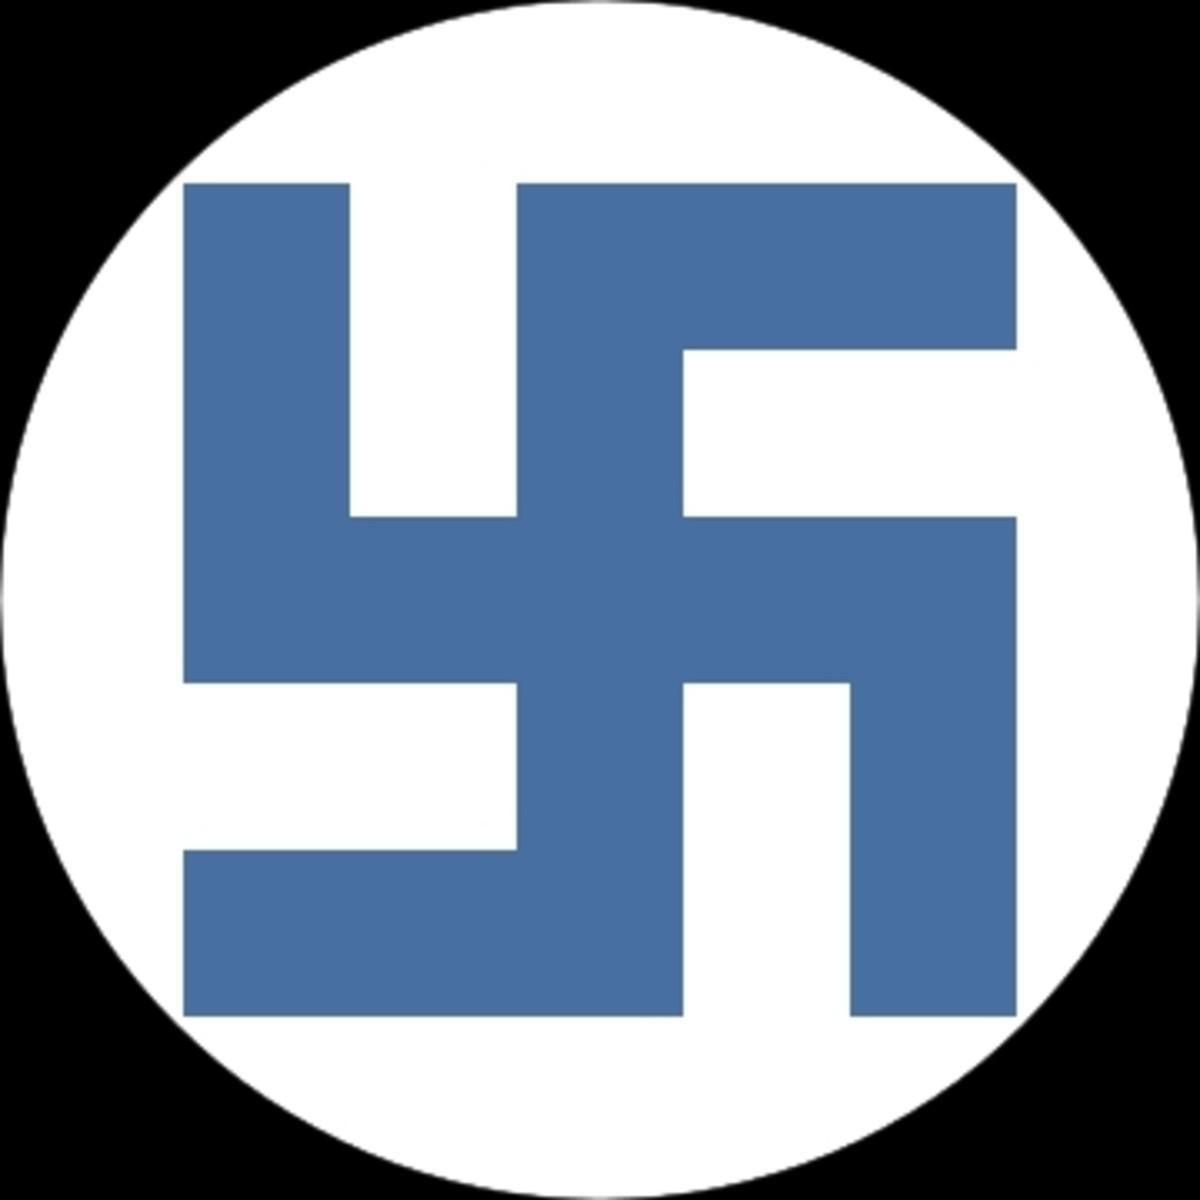 Finnish Air Force insignia 1918-1945